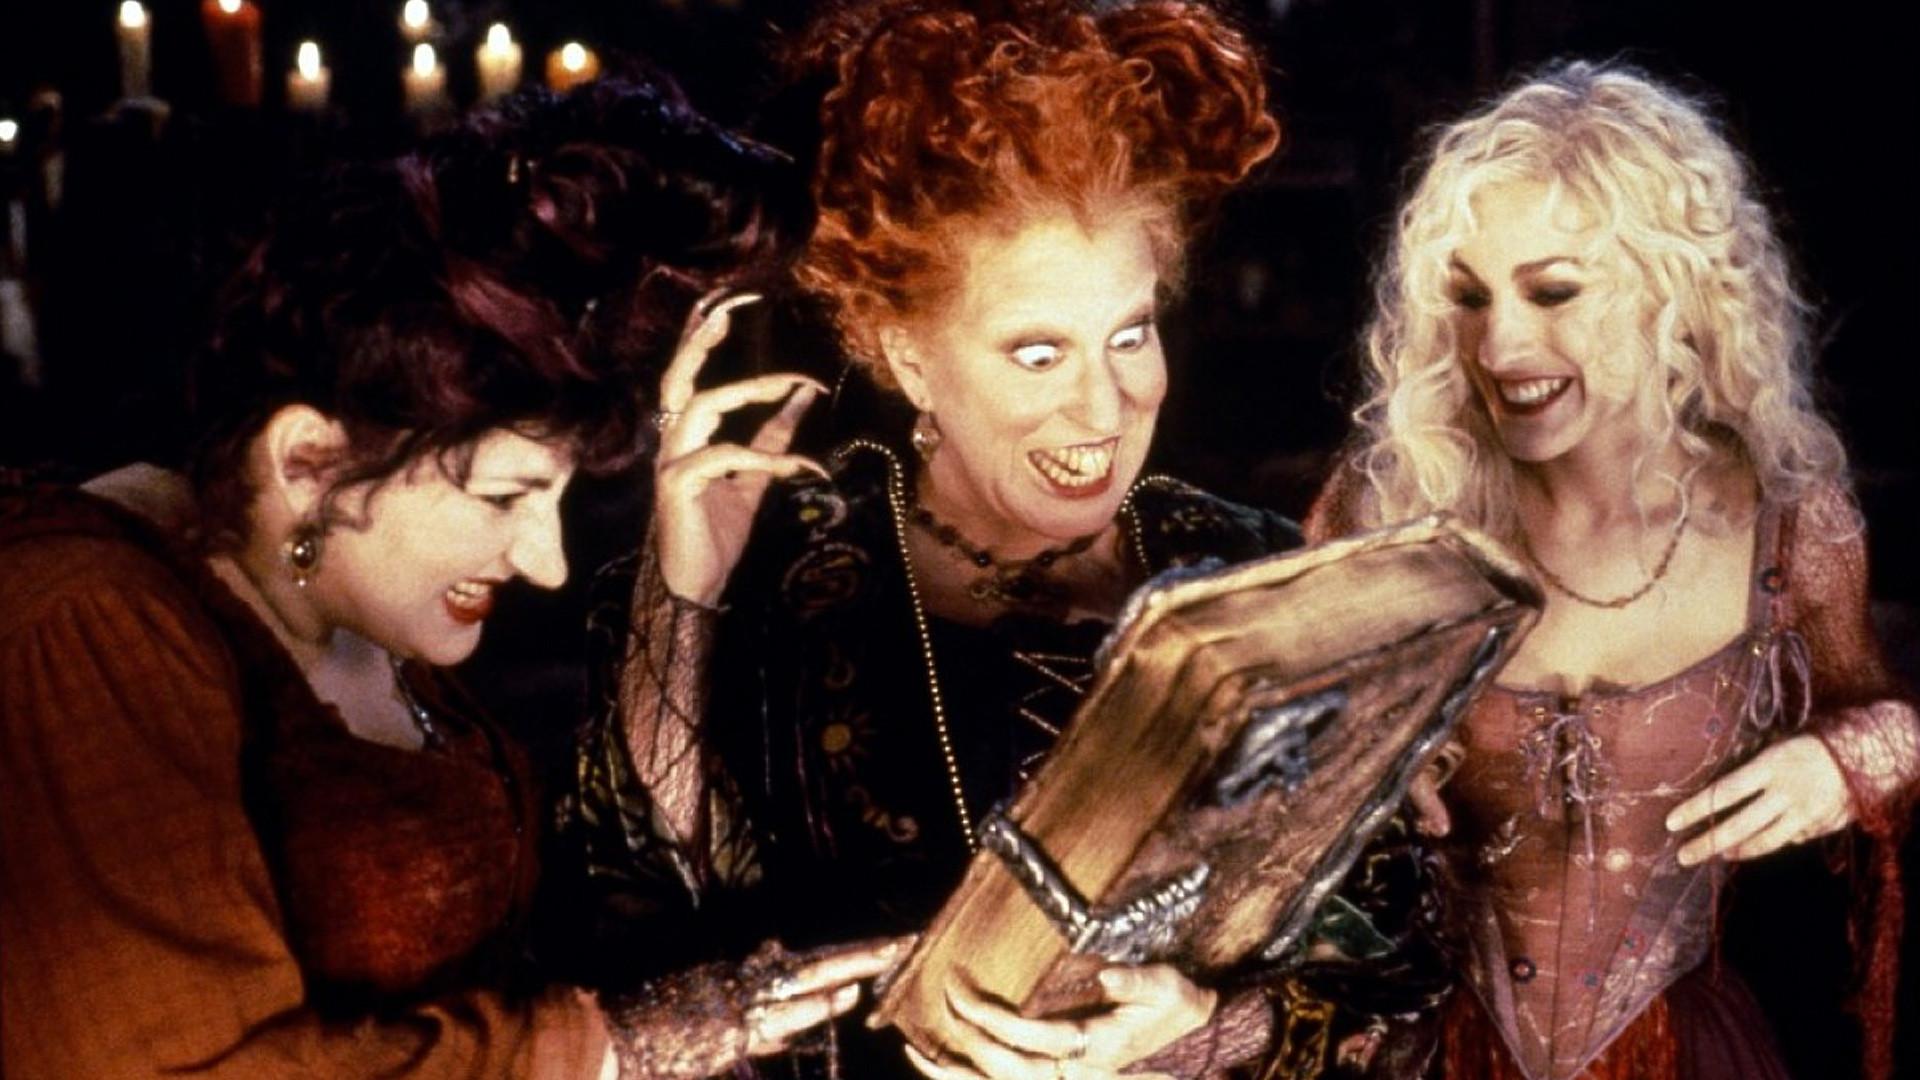 hocus-pocus-bette-midler-sarah-jessica-parker-kathy-najimy-1